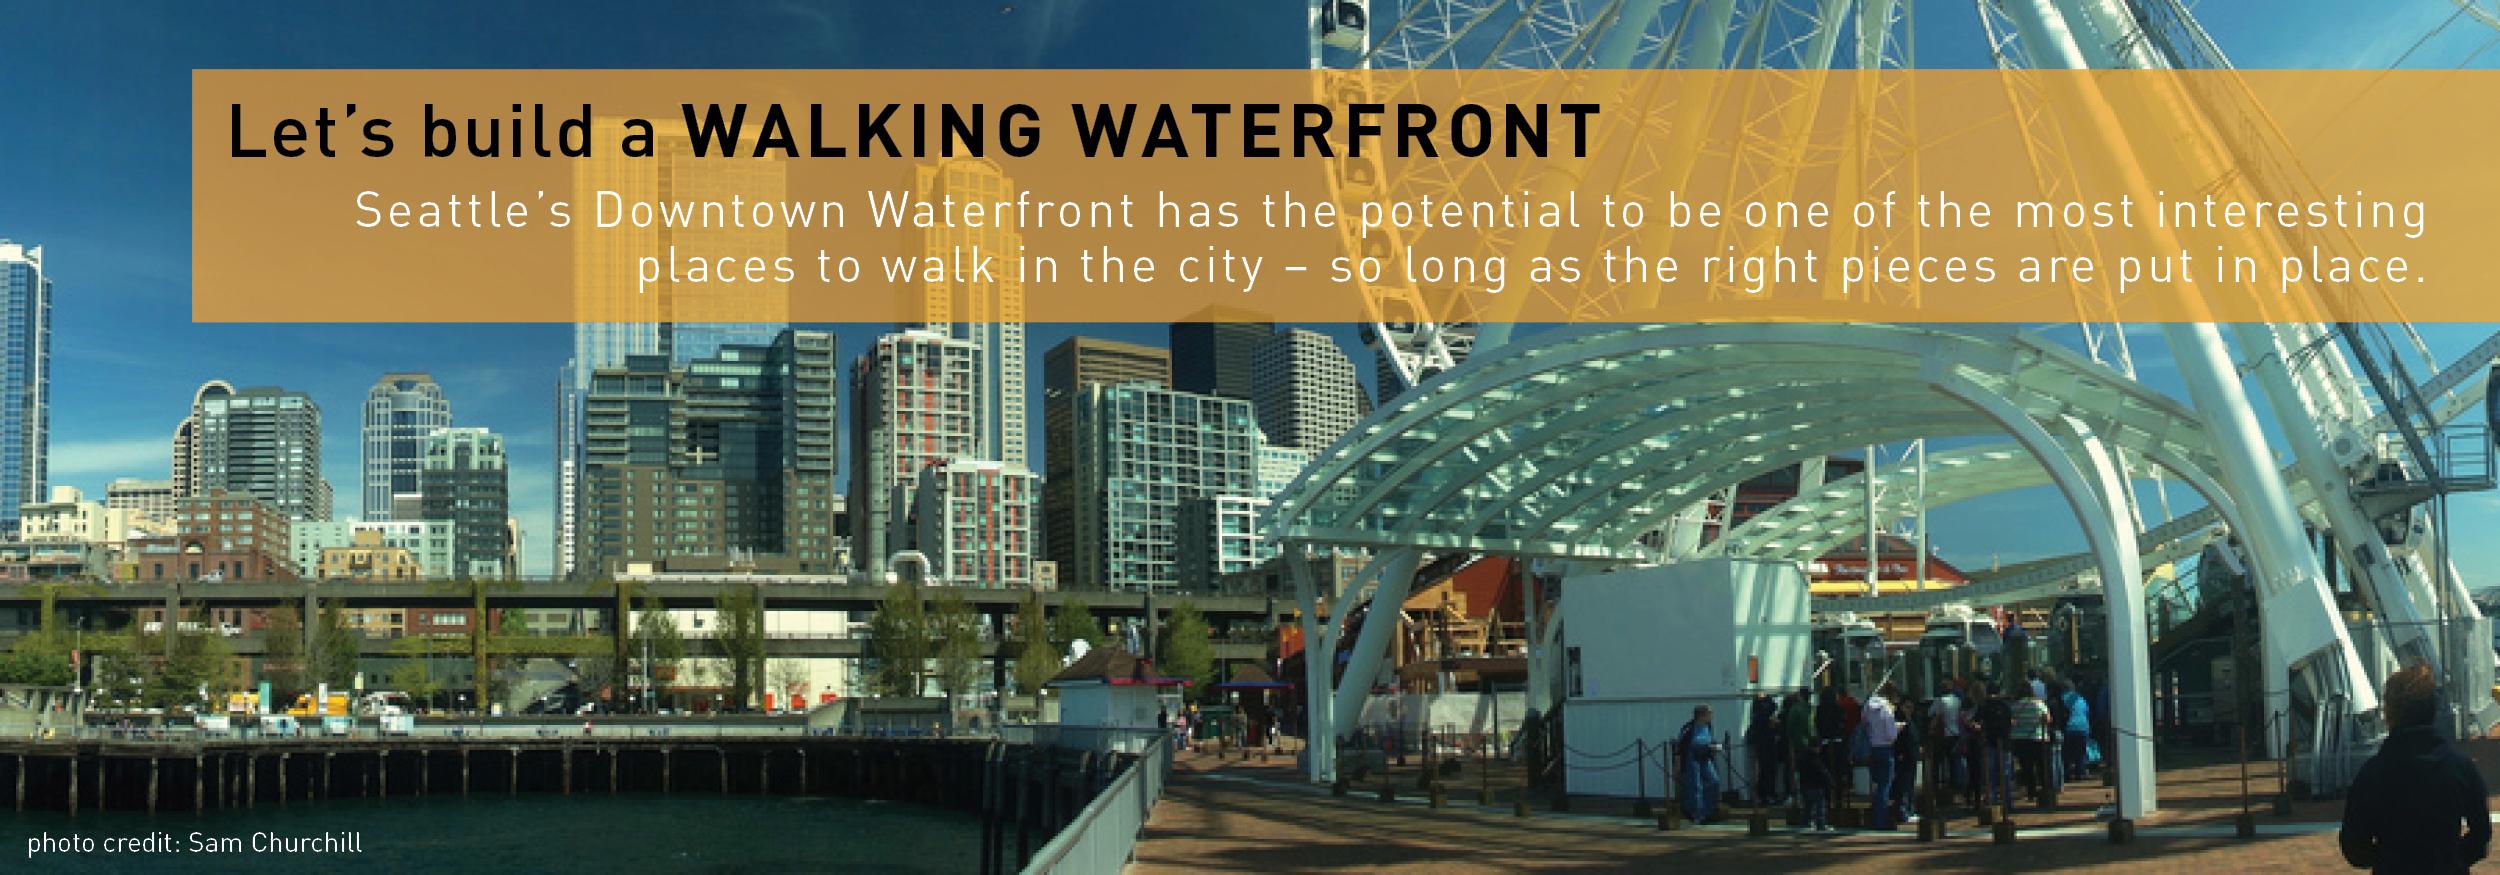 Walkable Waterfront